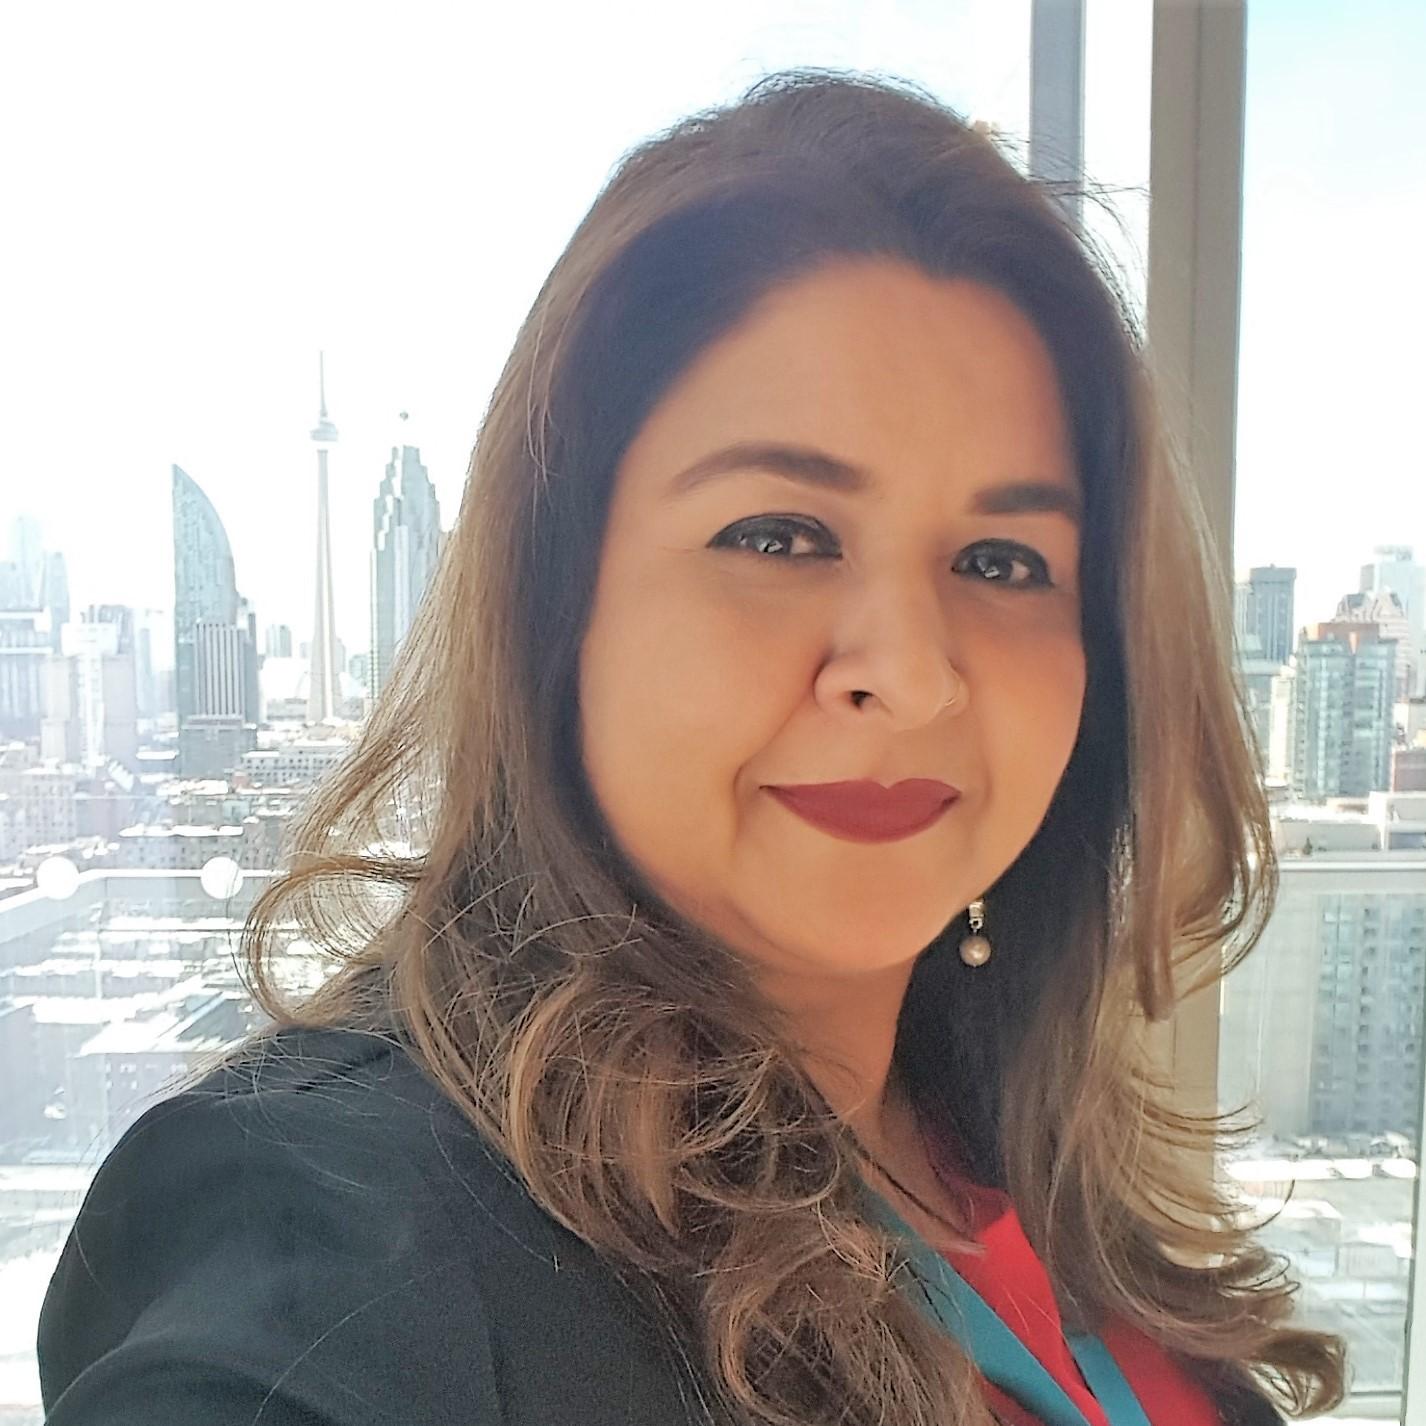 taranum-khan-is-a-career-strategist-educator-optimization-consultant-author-and-international-speaker-ep2277_thumbnail.png